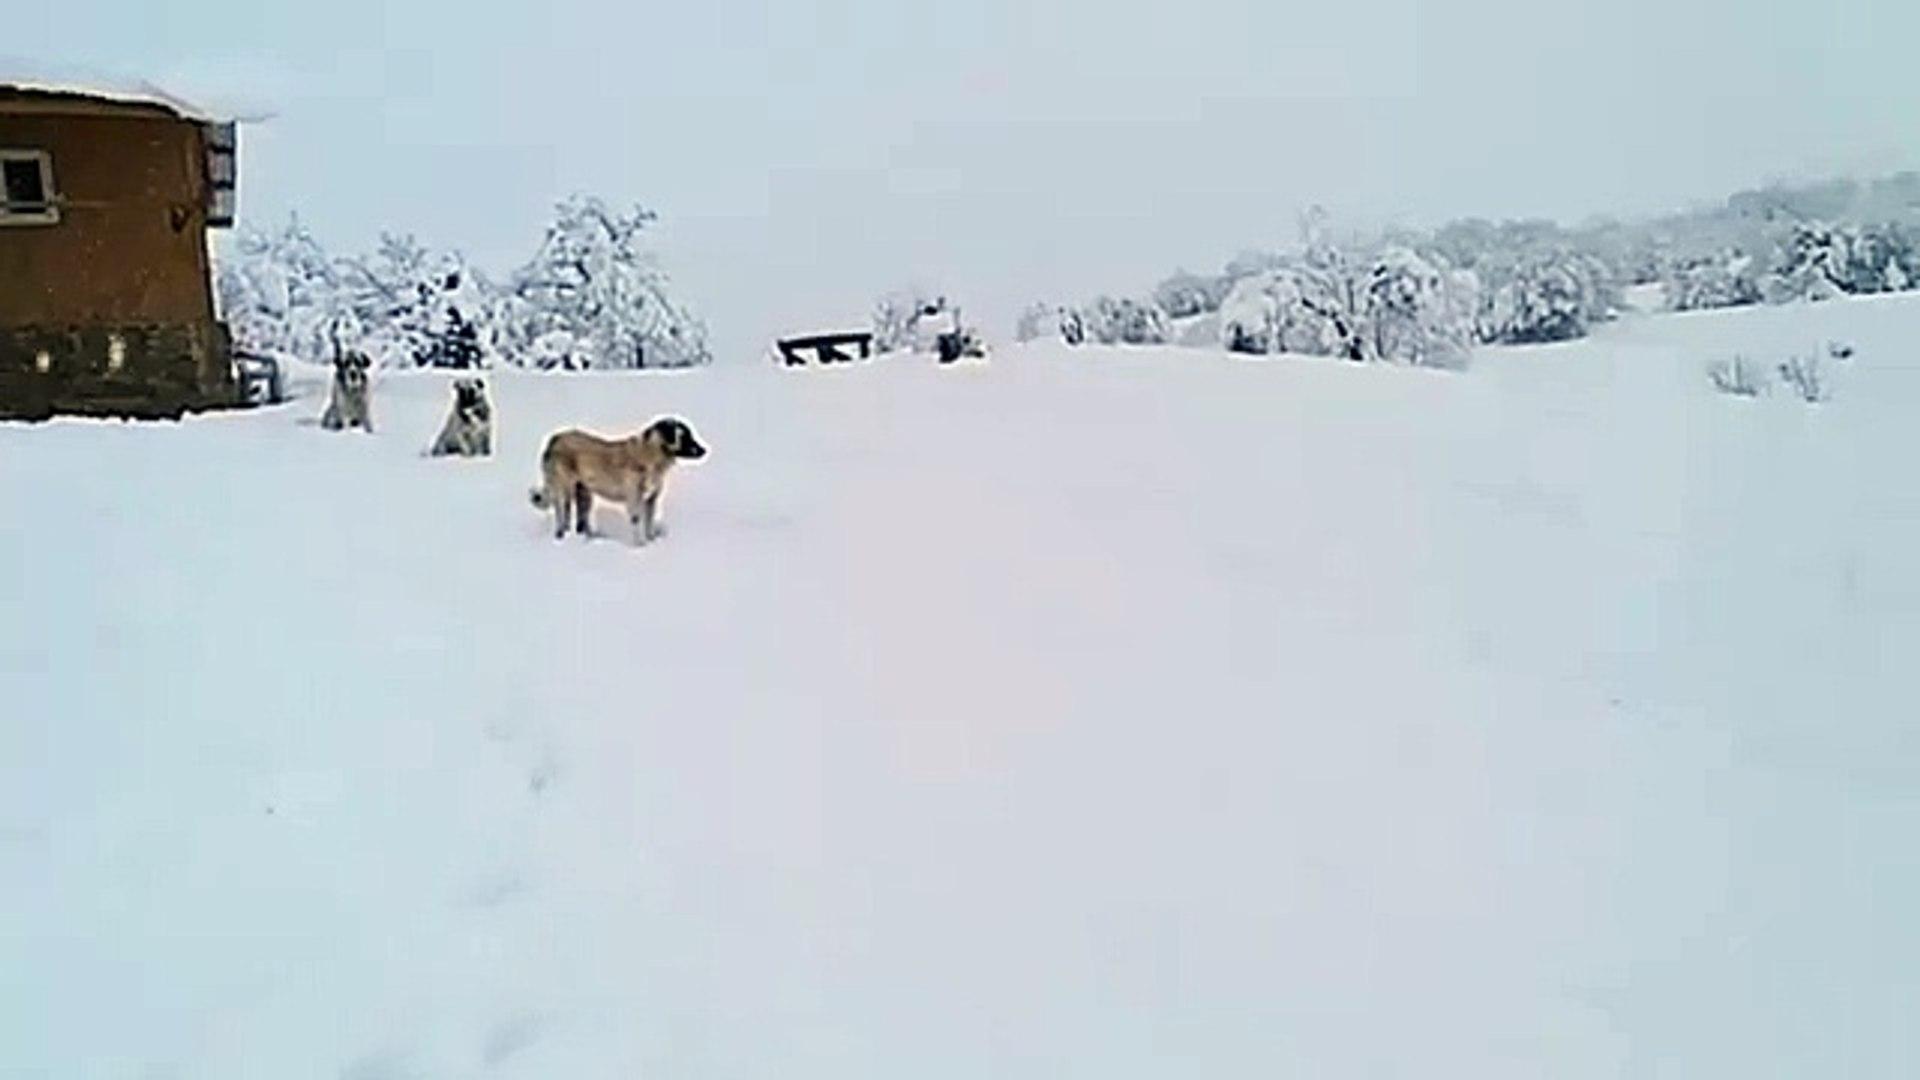 COBAN KOPEKLERi ve KAR MANZARASI - ANATOLiAN SHEPHERD DOGS and ViEWS SNOW